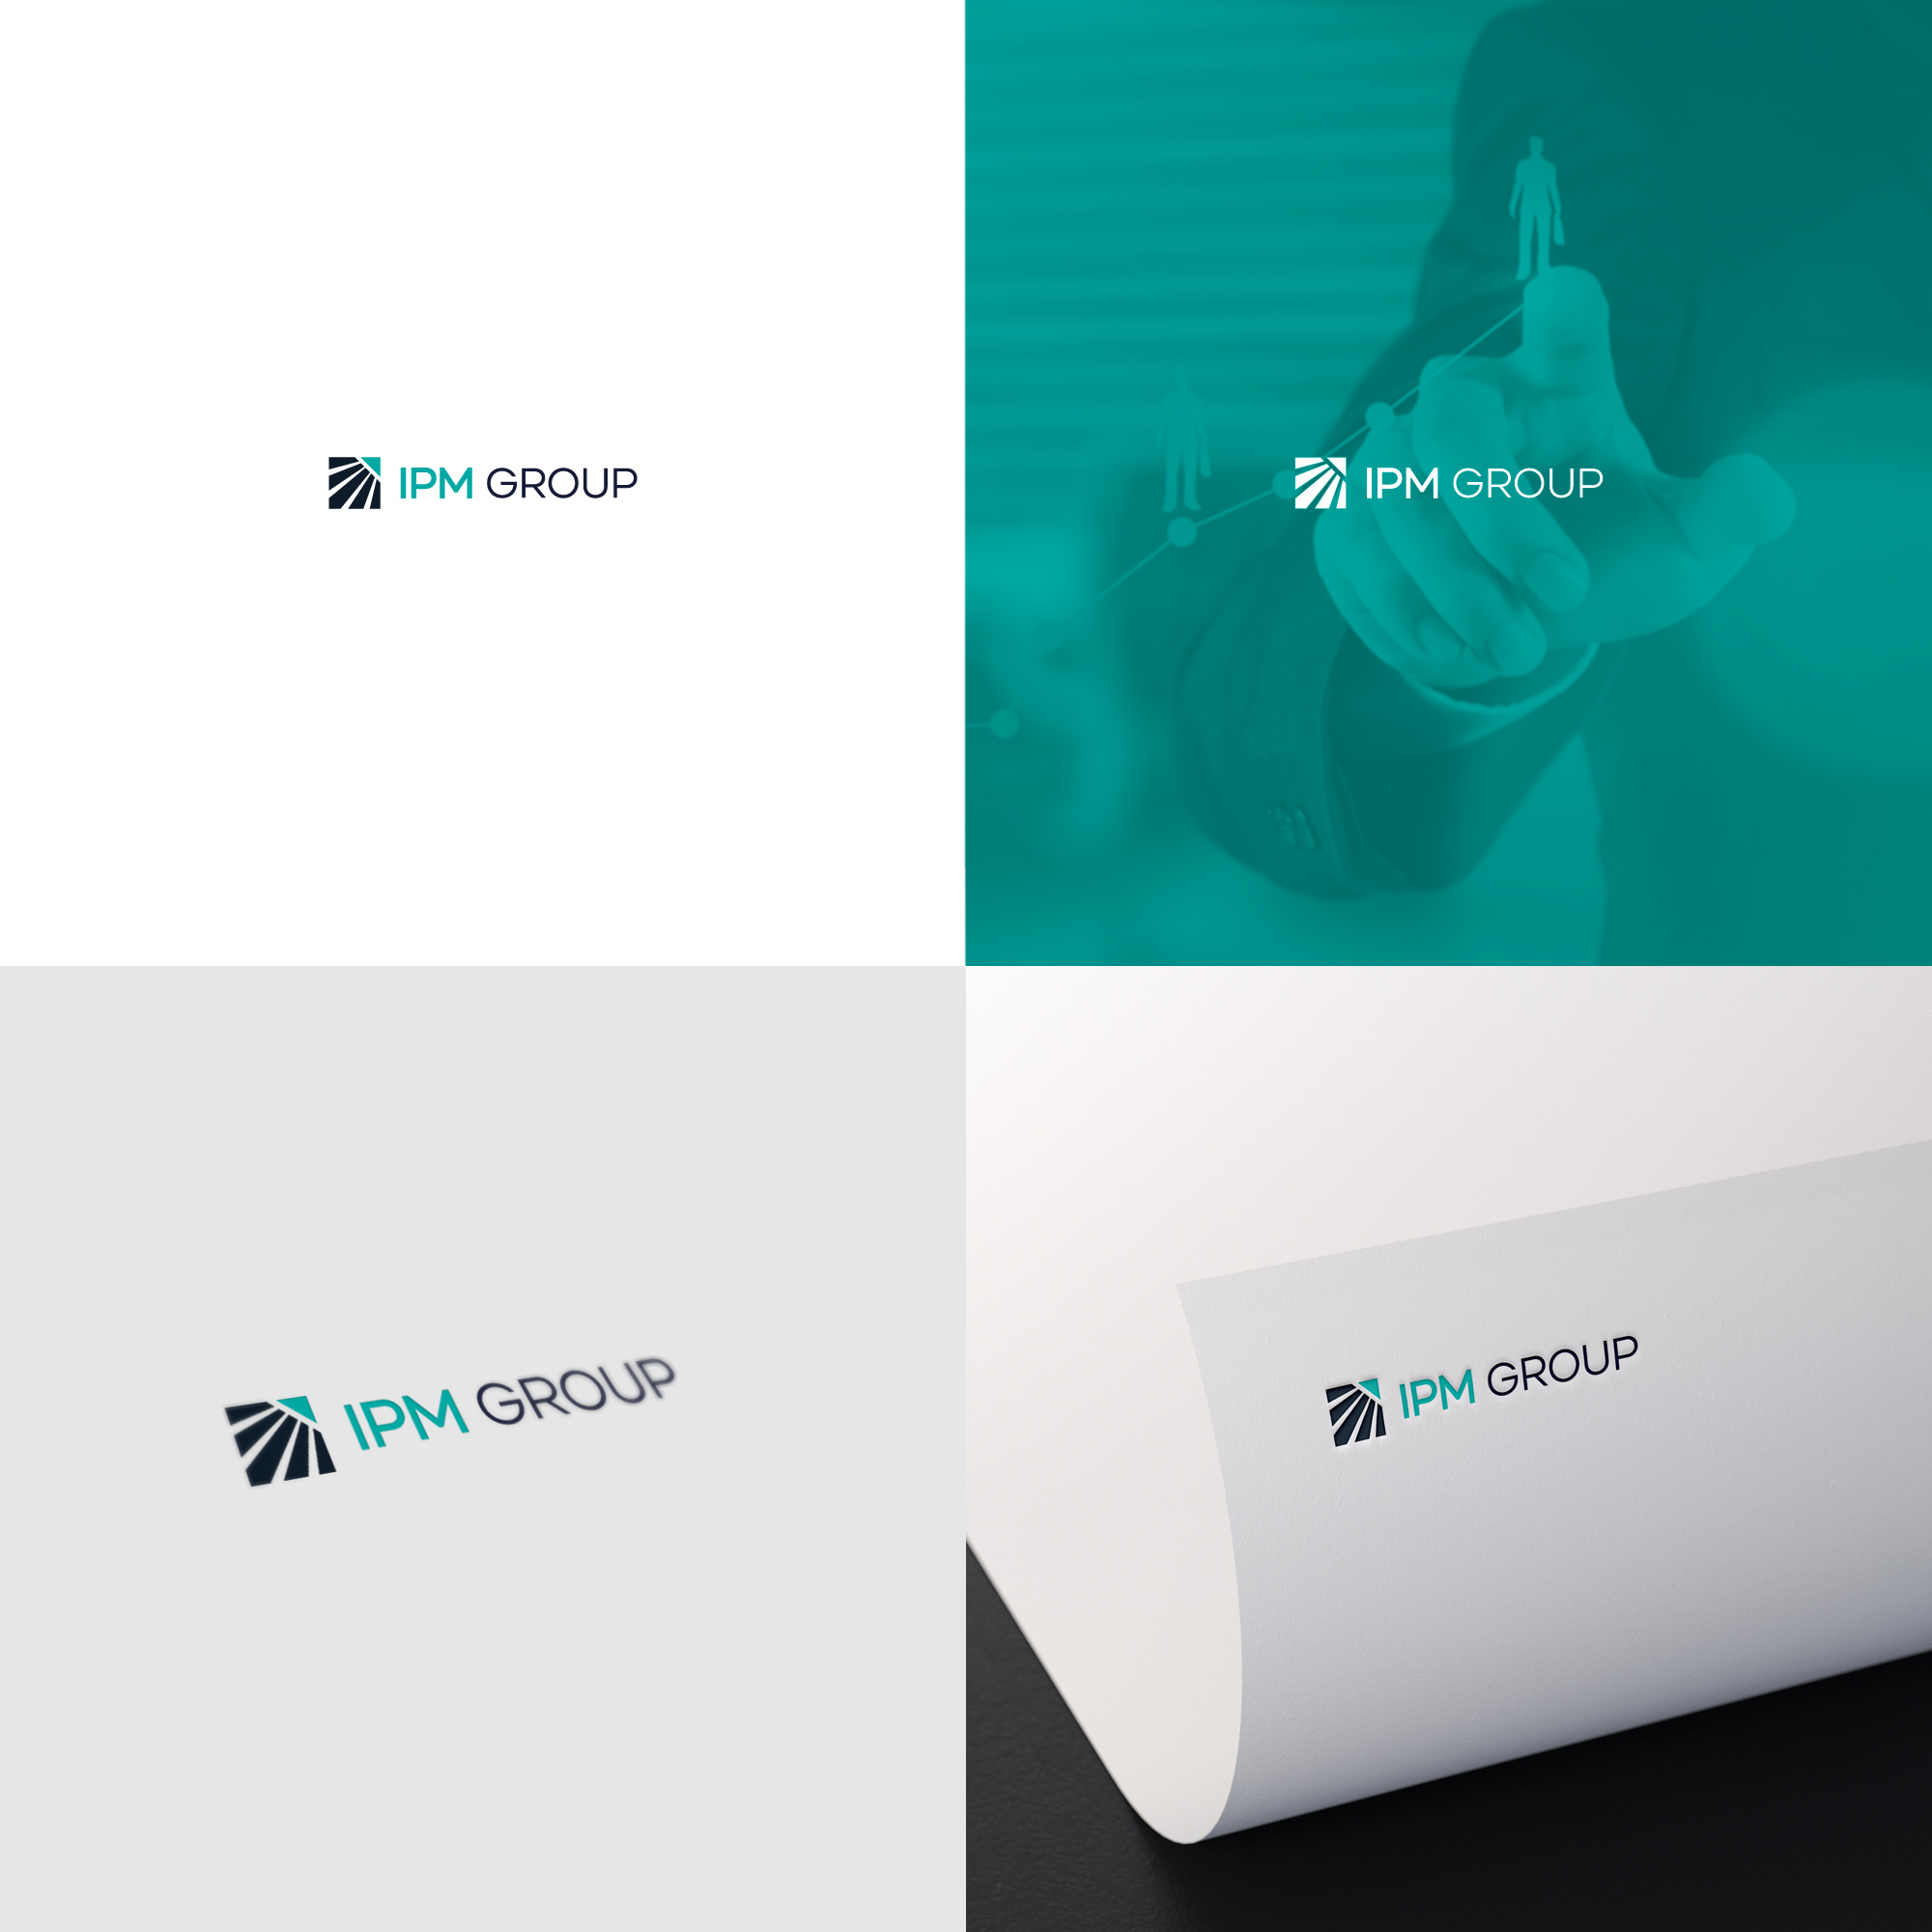 Разработка логотипа для управляющей компании фото f_2165f83a71f0d3ef.jpg